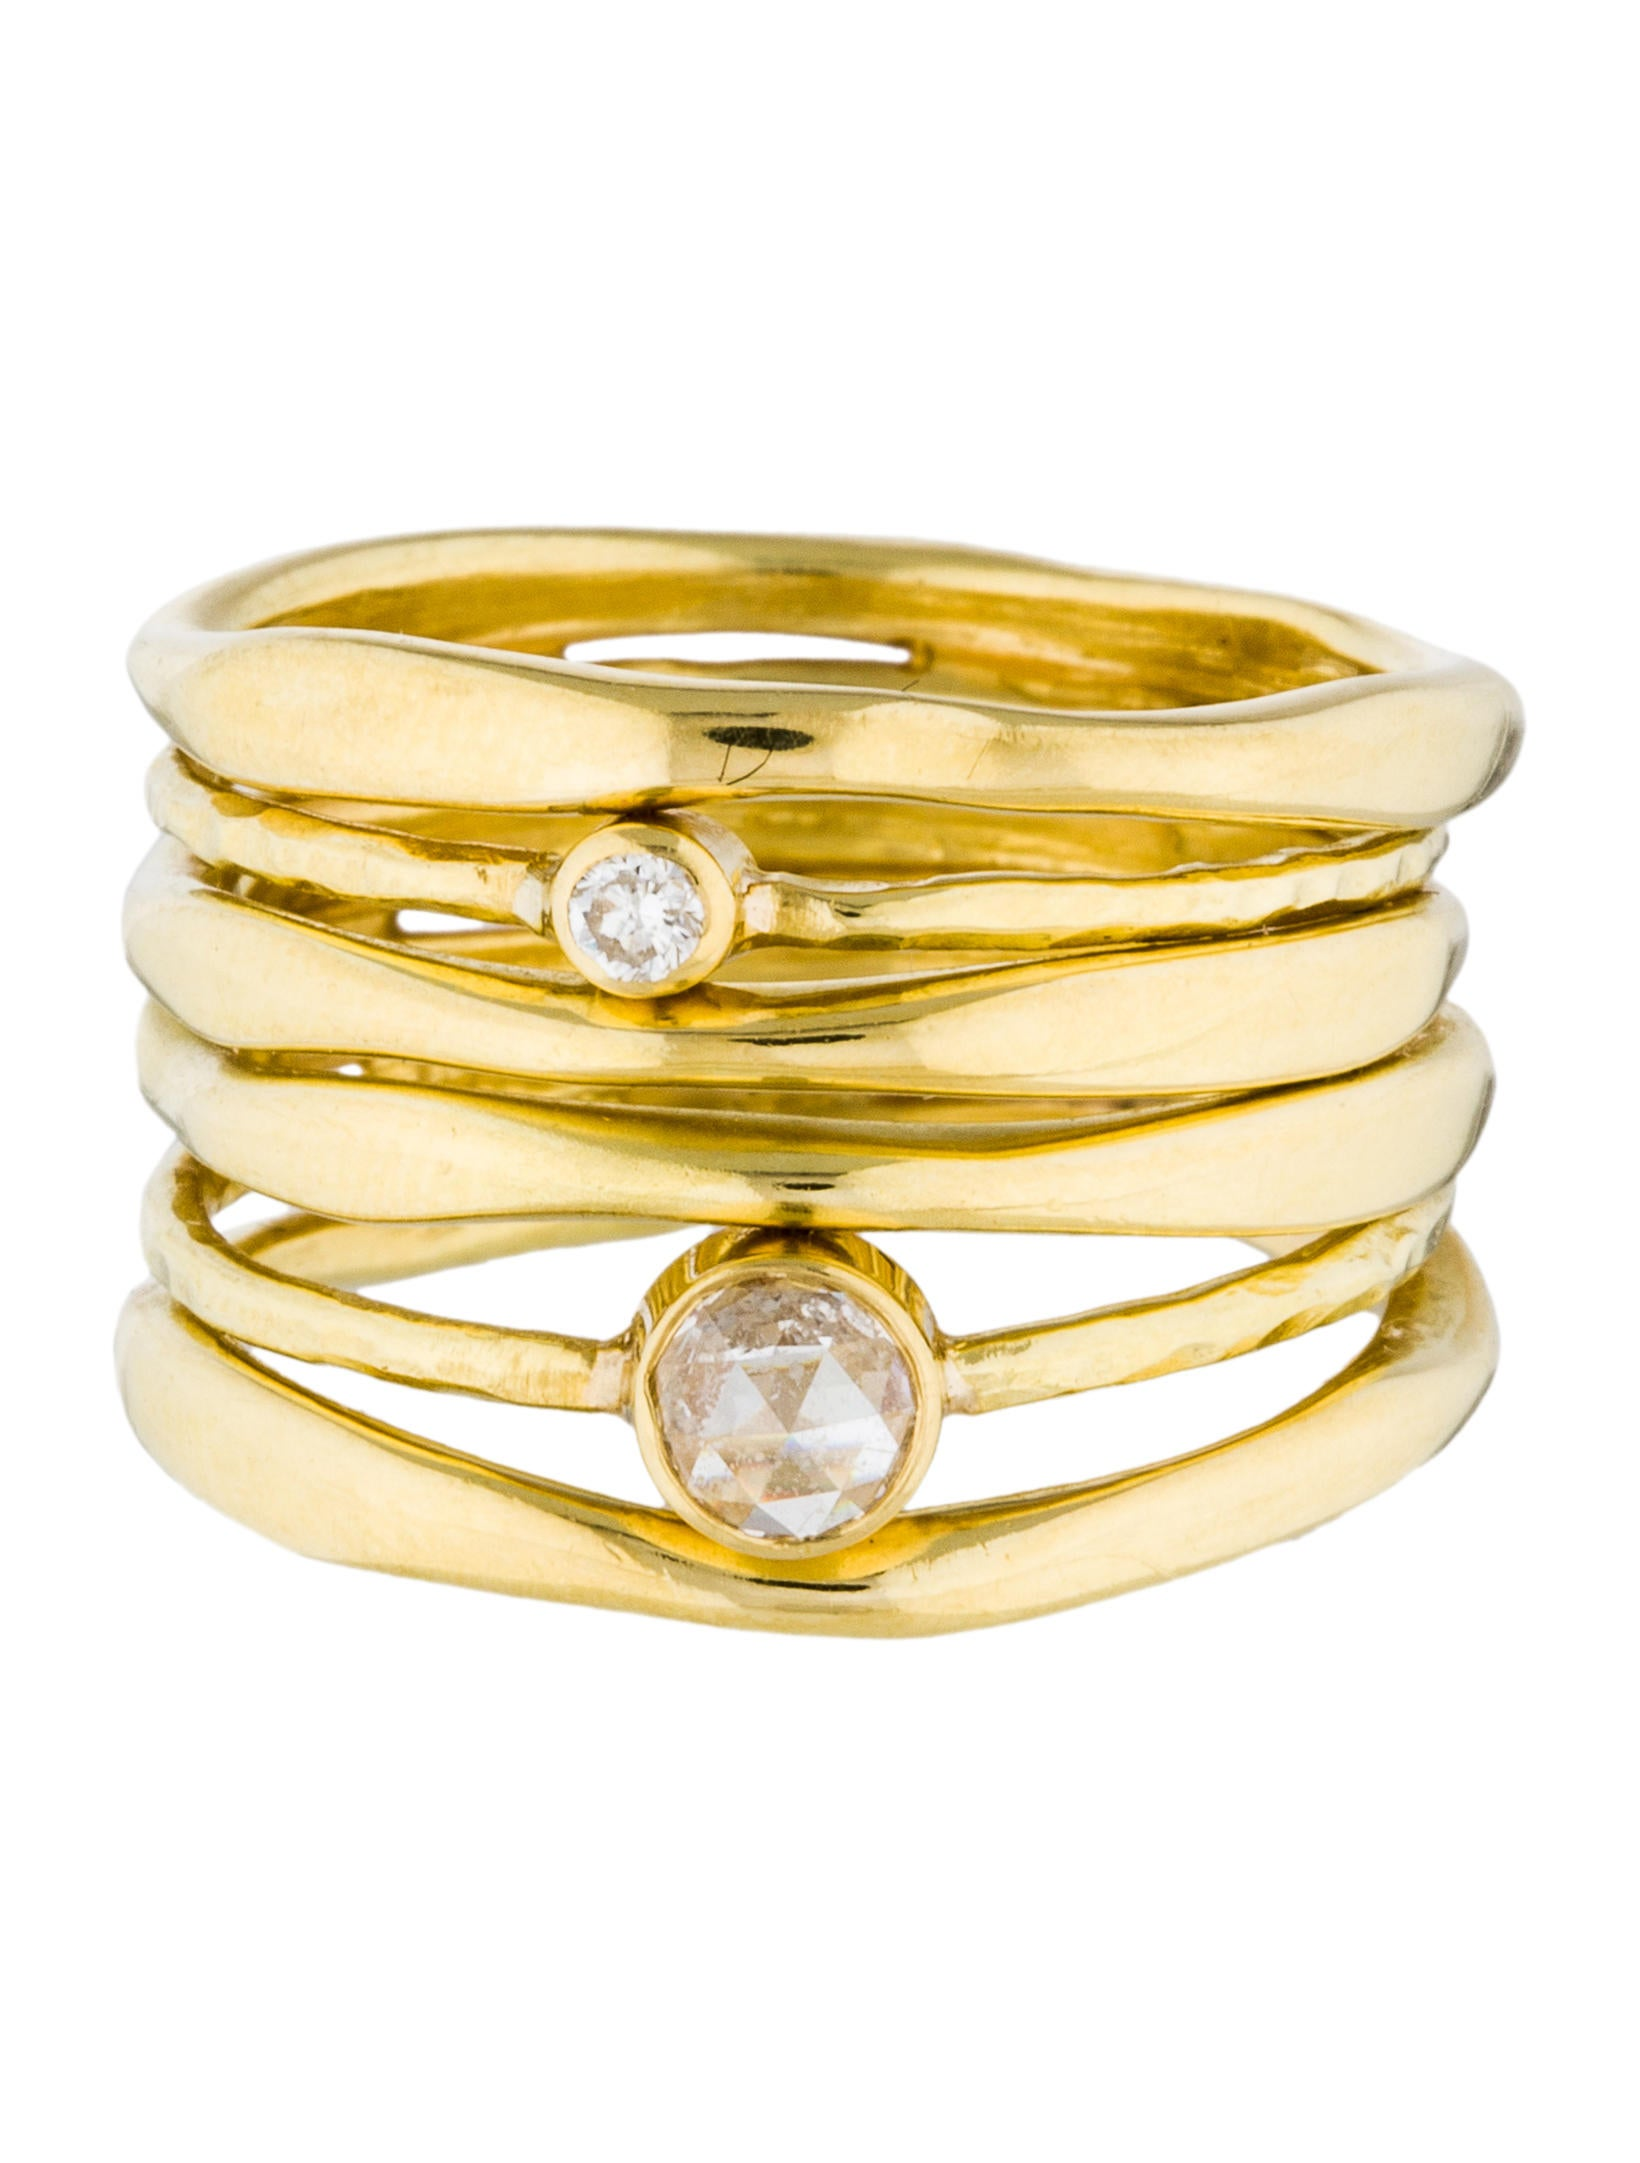 Ippolita 18k Diamond Movie Star Ring  Rings  Ipp26811. Part Rings. Blue Diamond Accent Engagement Rings. Little Mermaid Engagement Rings. Sovereign Rings. Everyday Rings. Islamic Wedding Rings. Border Wedding Rings. .5 Carat Engagement Rings